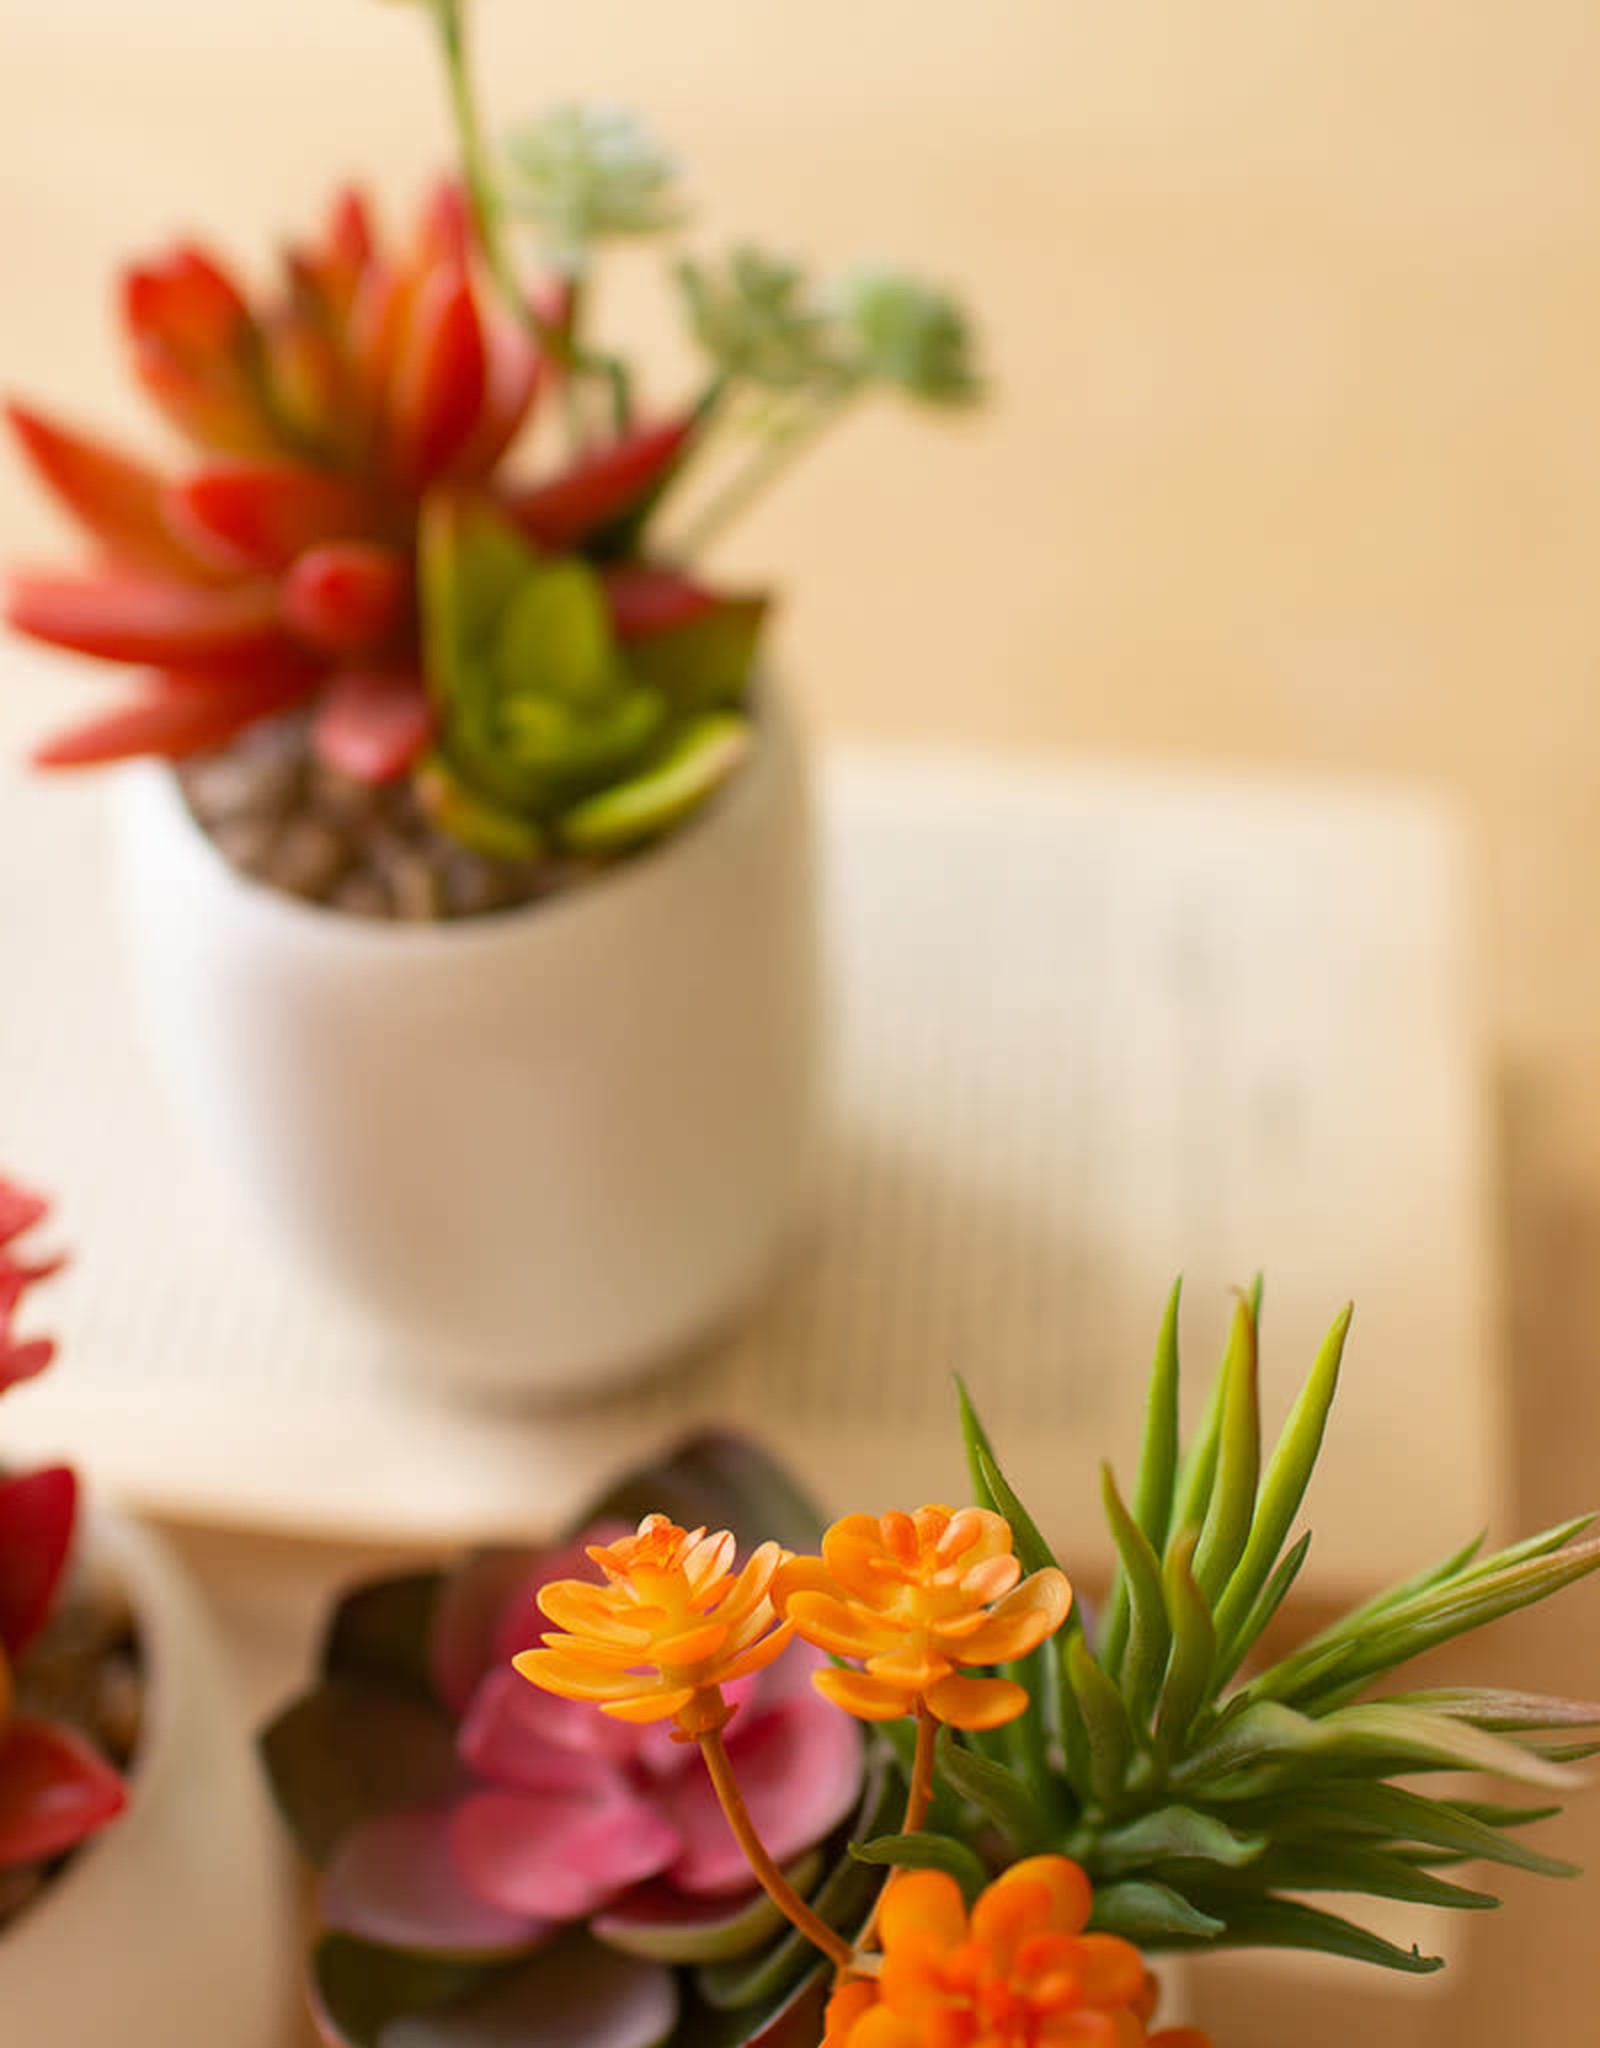 Kalalou Artificial Succulent Plants in a White Ceramic Pot (set of 3)